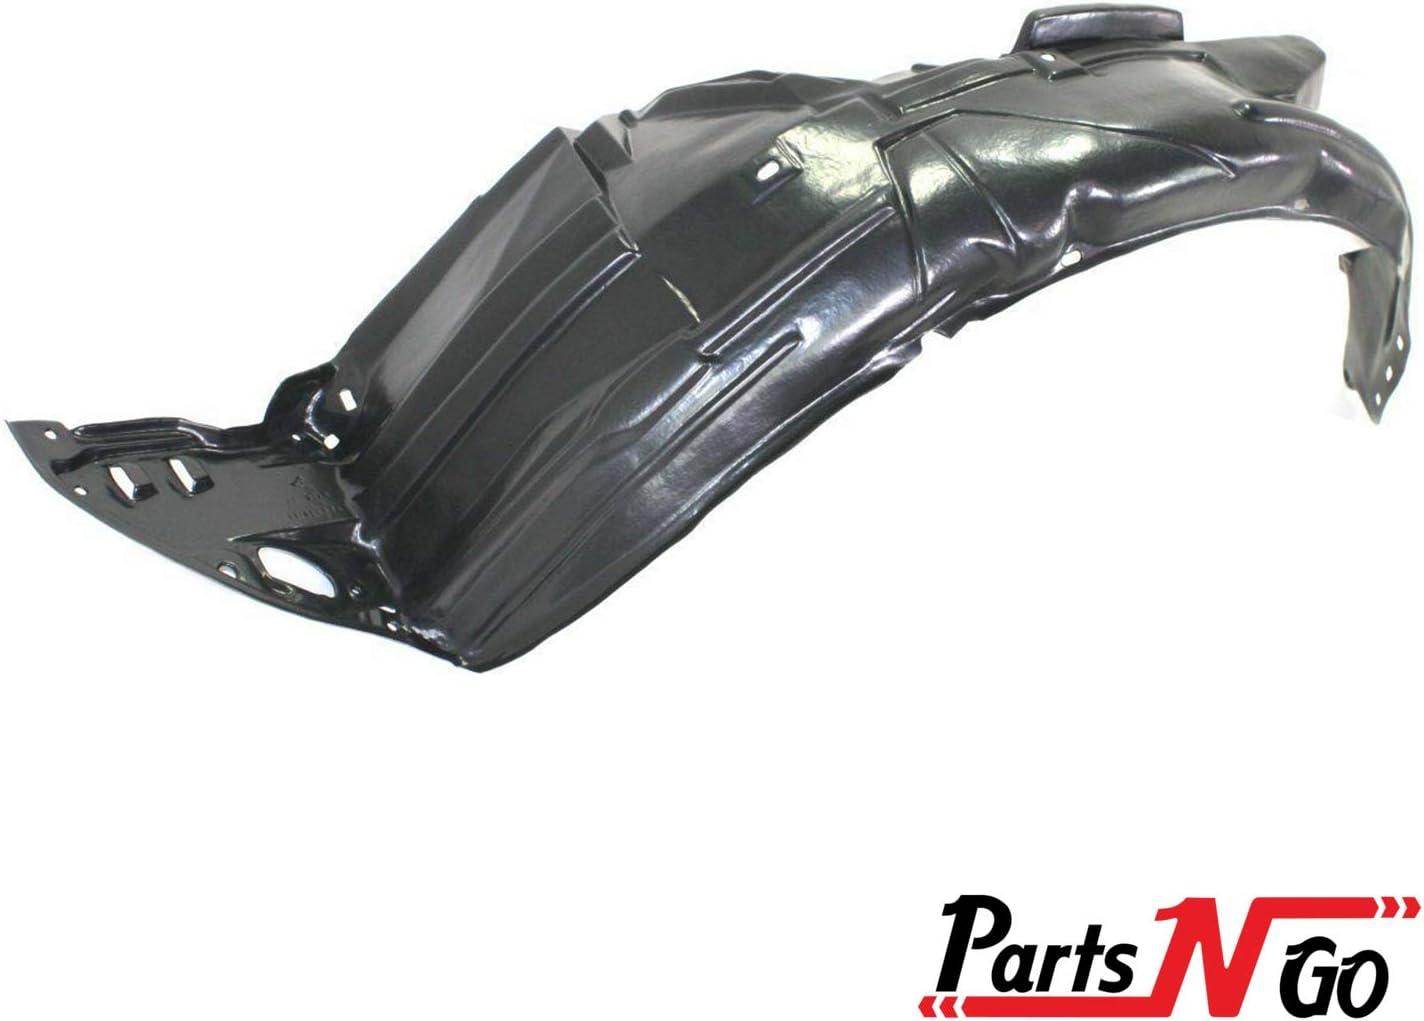 Parts N Go 06-11 Civic Fender Liners Compatible Honda Splash Guard Pair Front Driver /& Passenger Side LH//RH Liner HO1251106 74101-SVA-A00 HO1250106 74151-SVA-A00